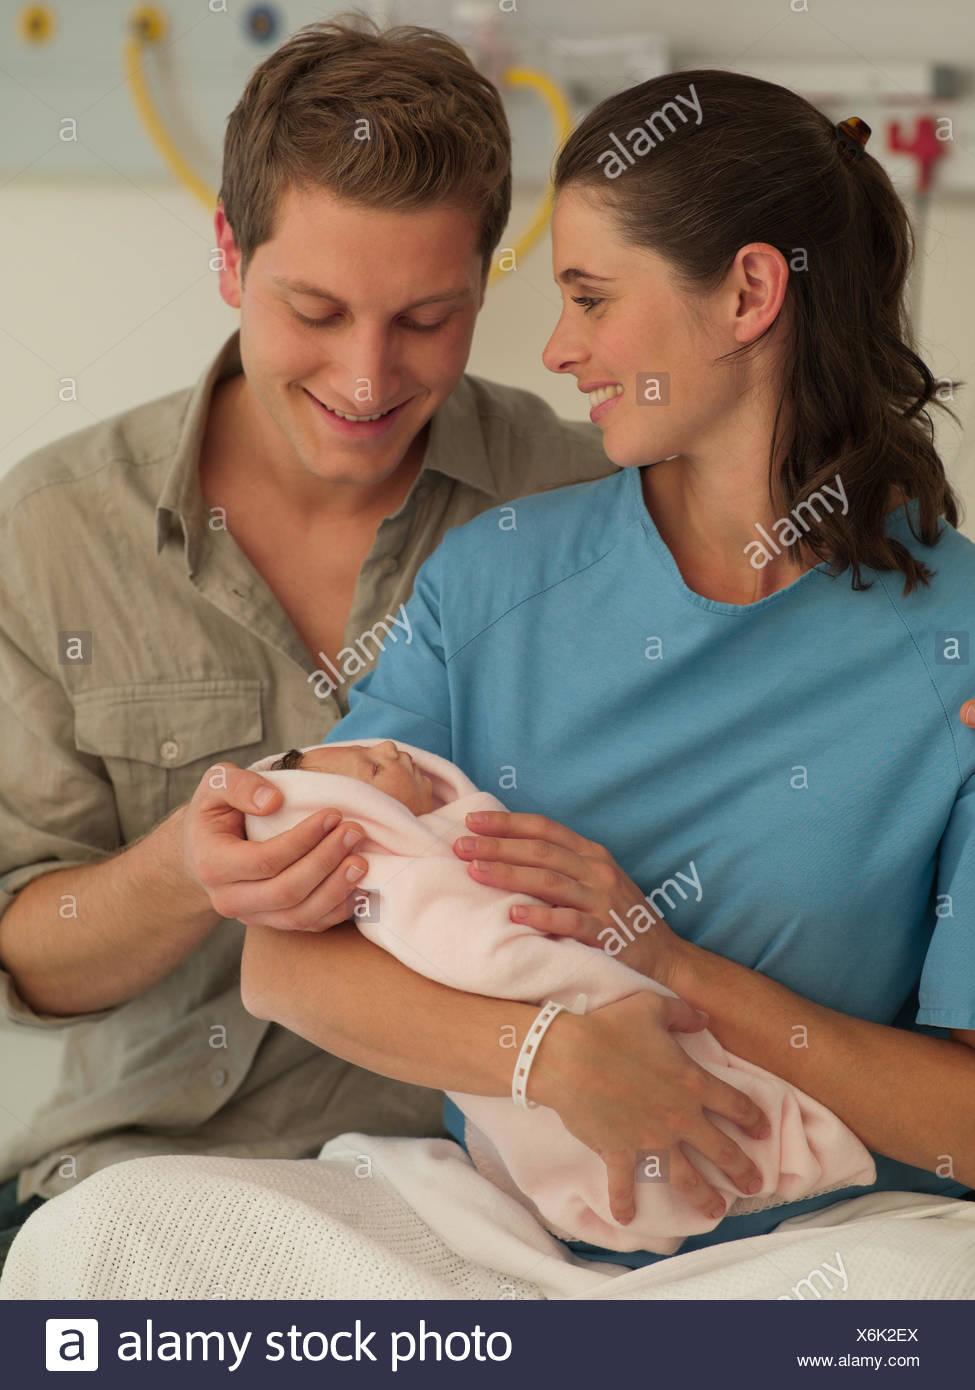 Couple holding newborn baby in hospital - Stock Image